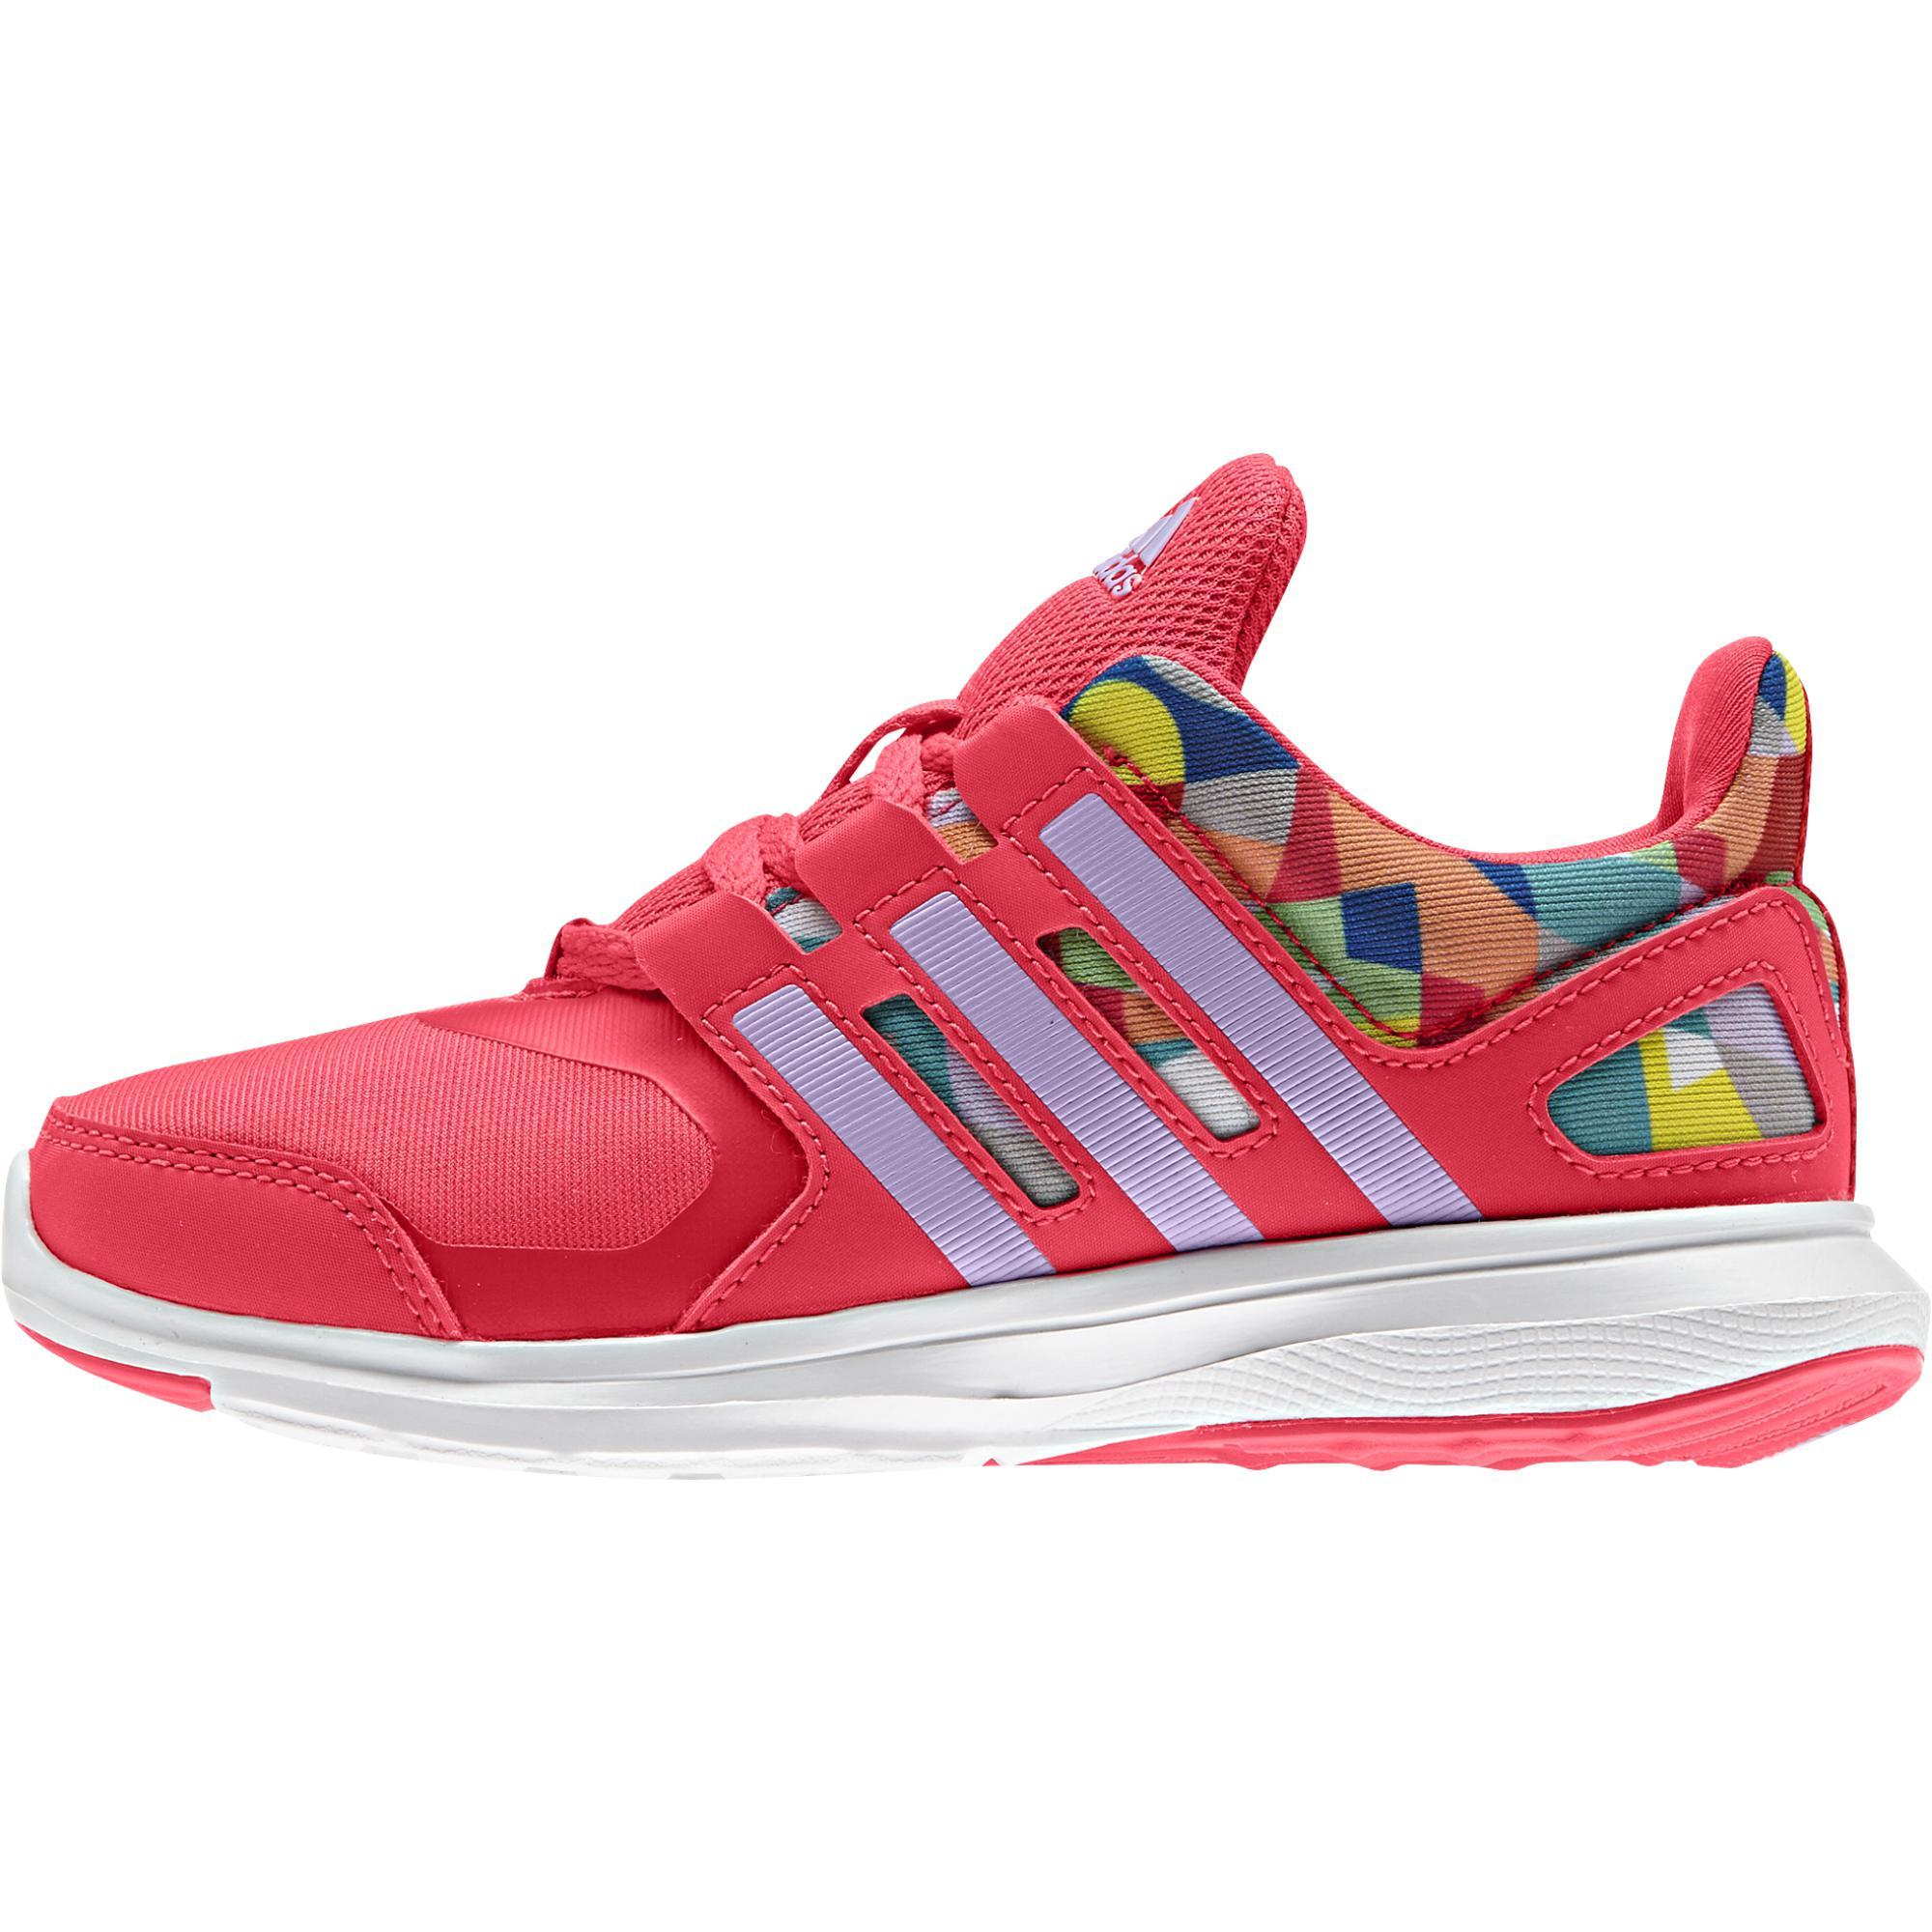 Adidas Dievčenské bežecké tenisky Hyperfast - ružové 0a81c14f2d